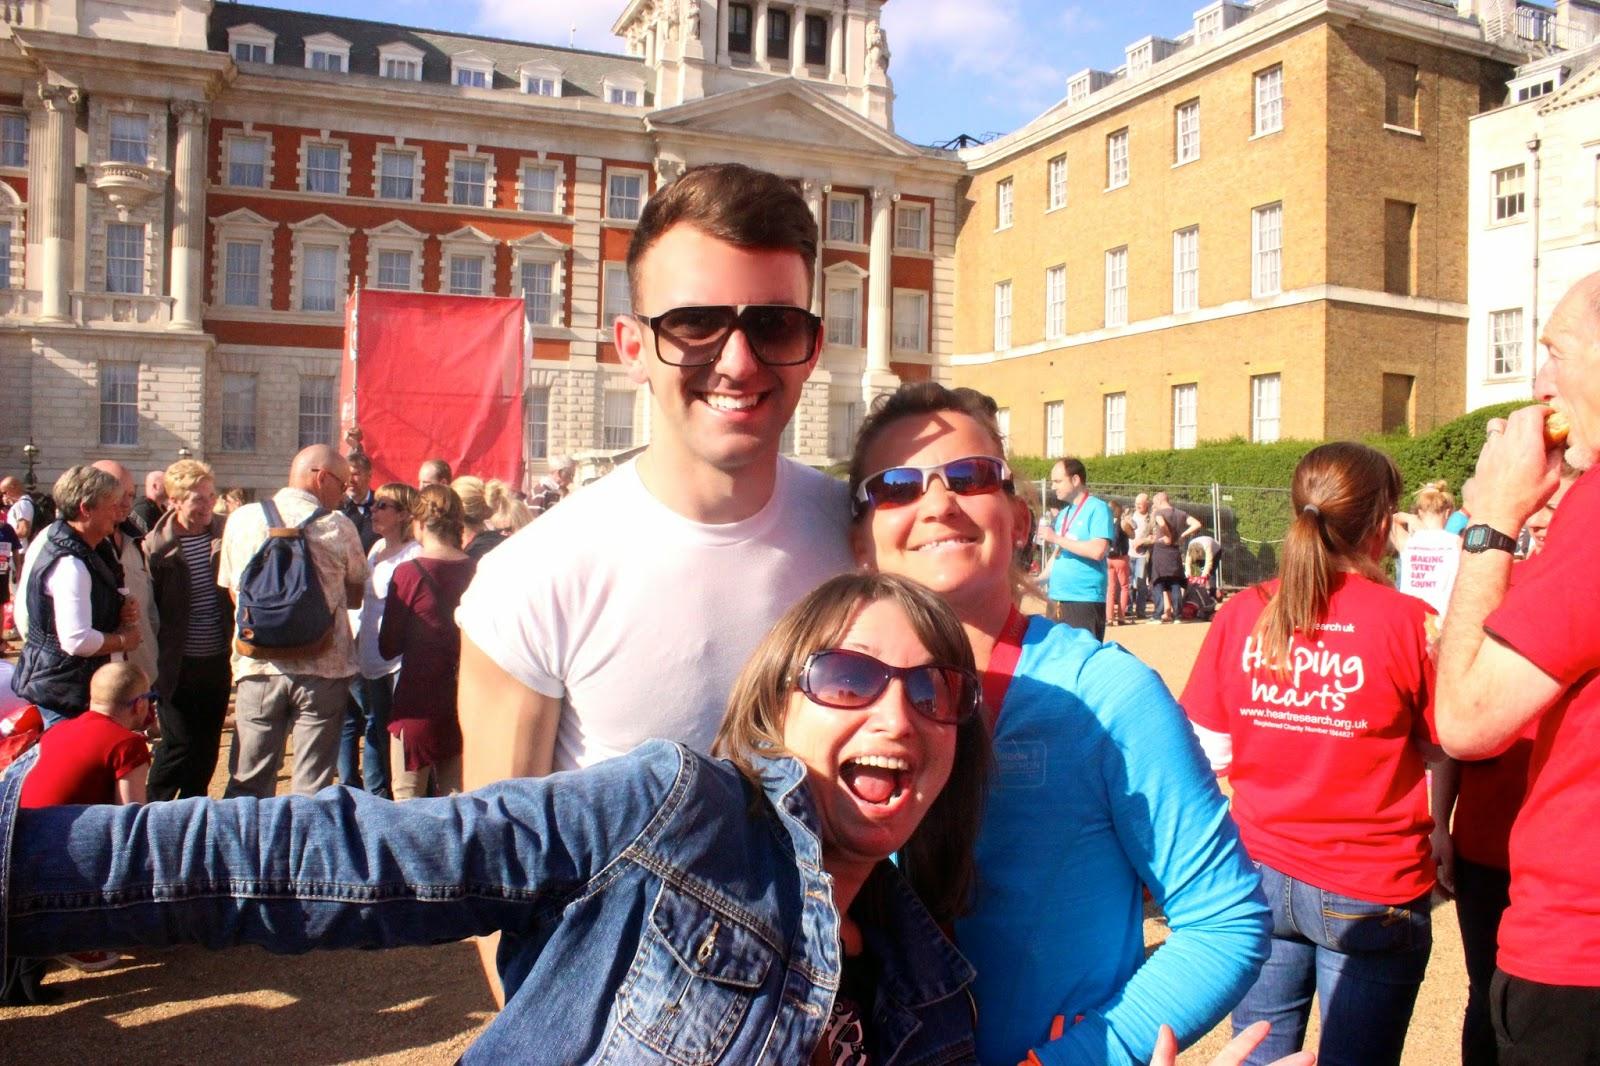 London Marathon 2014, That Guy Lukey, Fitness, Marathon, London, England, Virgin London Marathon 2014, blog, racing, running, sport, Marathon Running, Spectators, Marathon spectators, horse guards parade